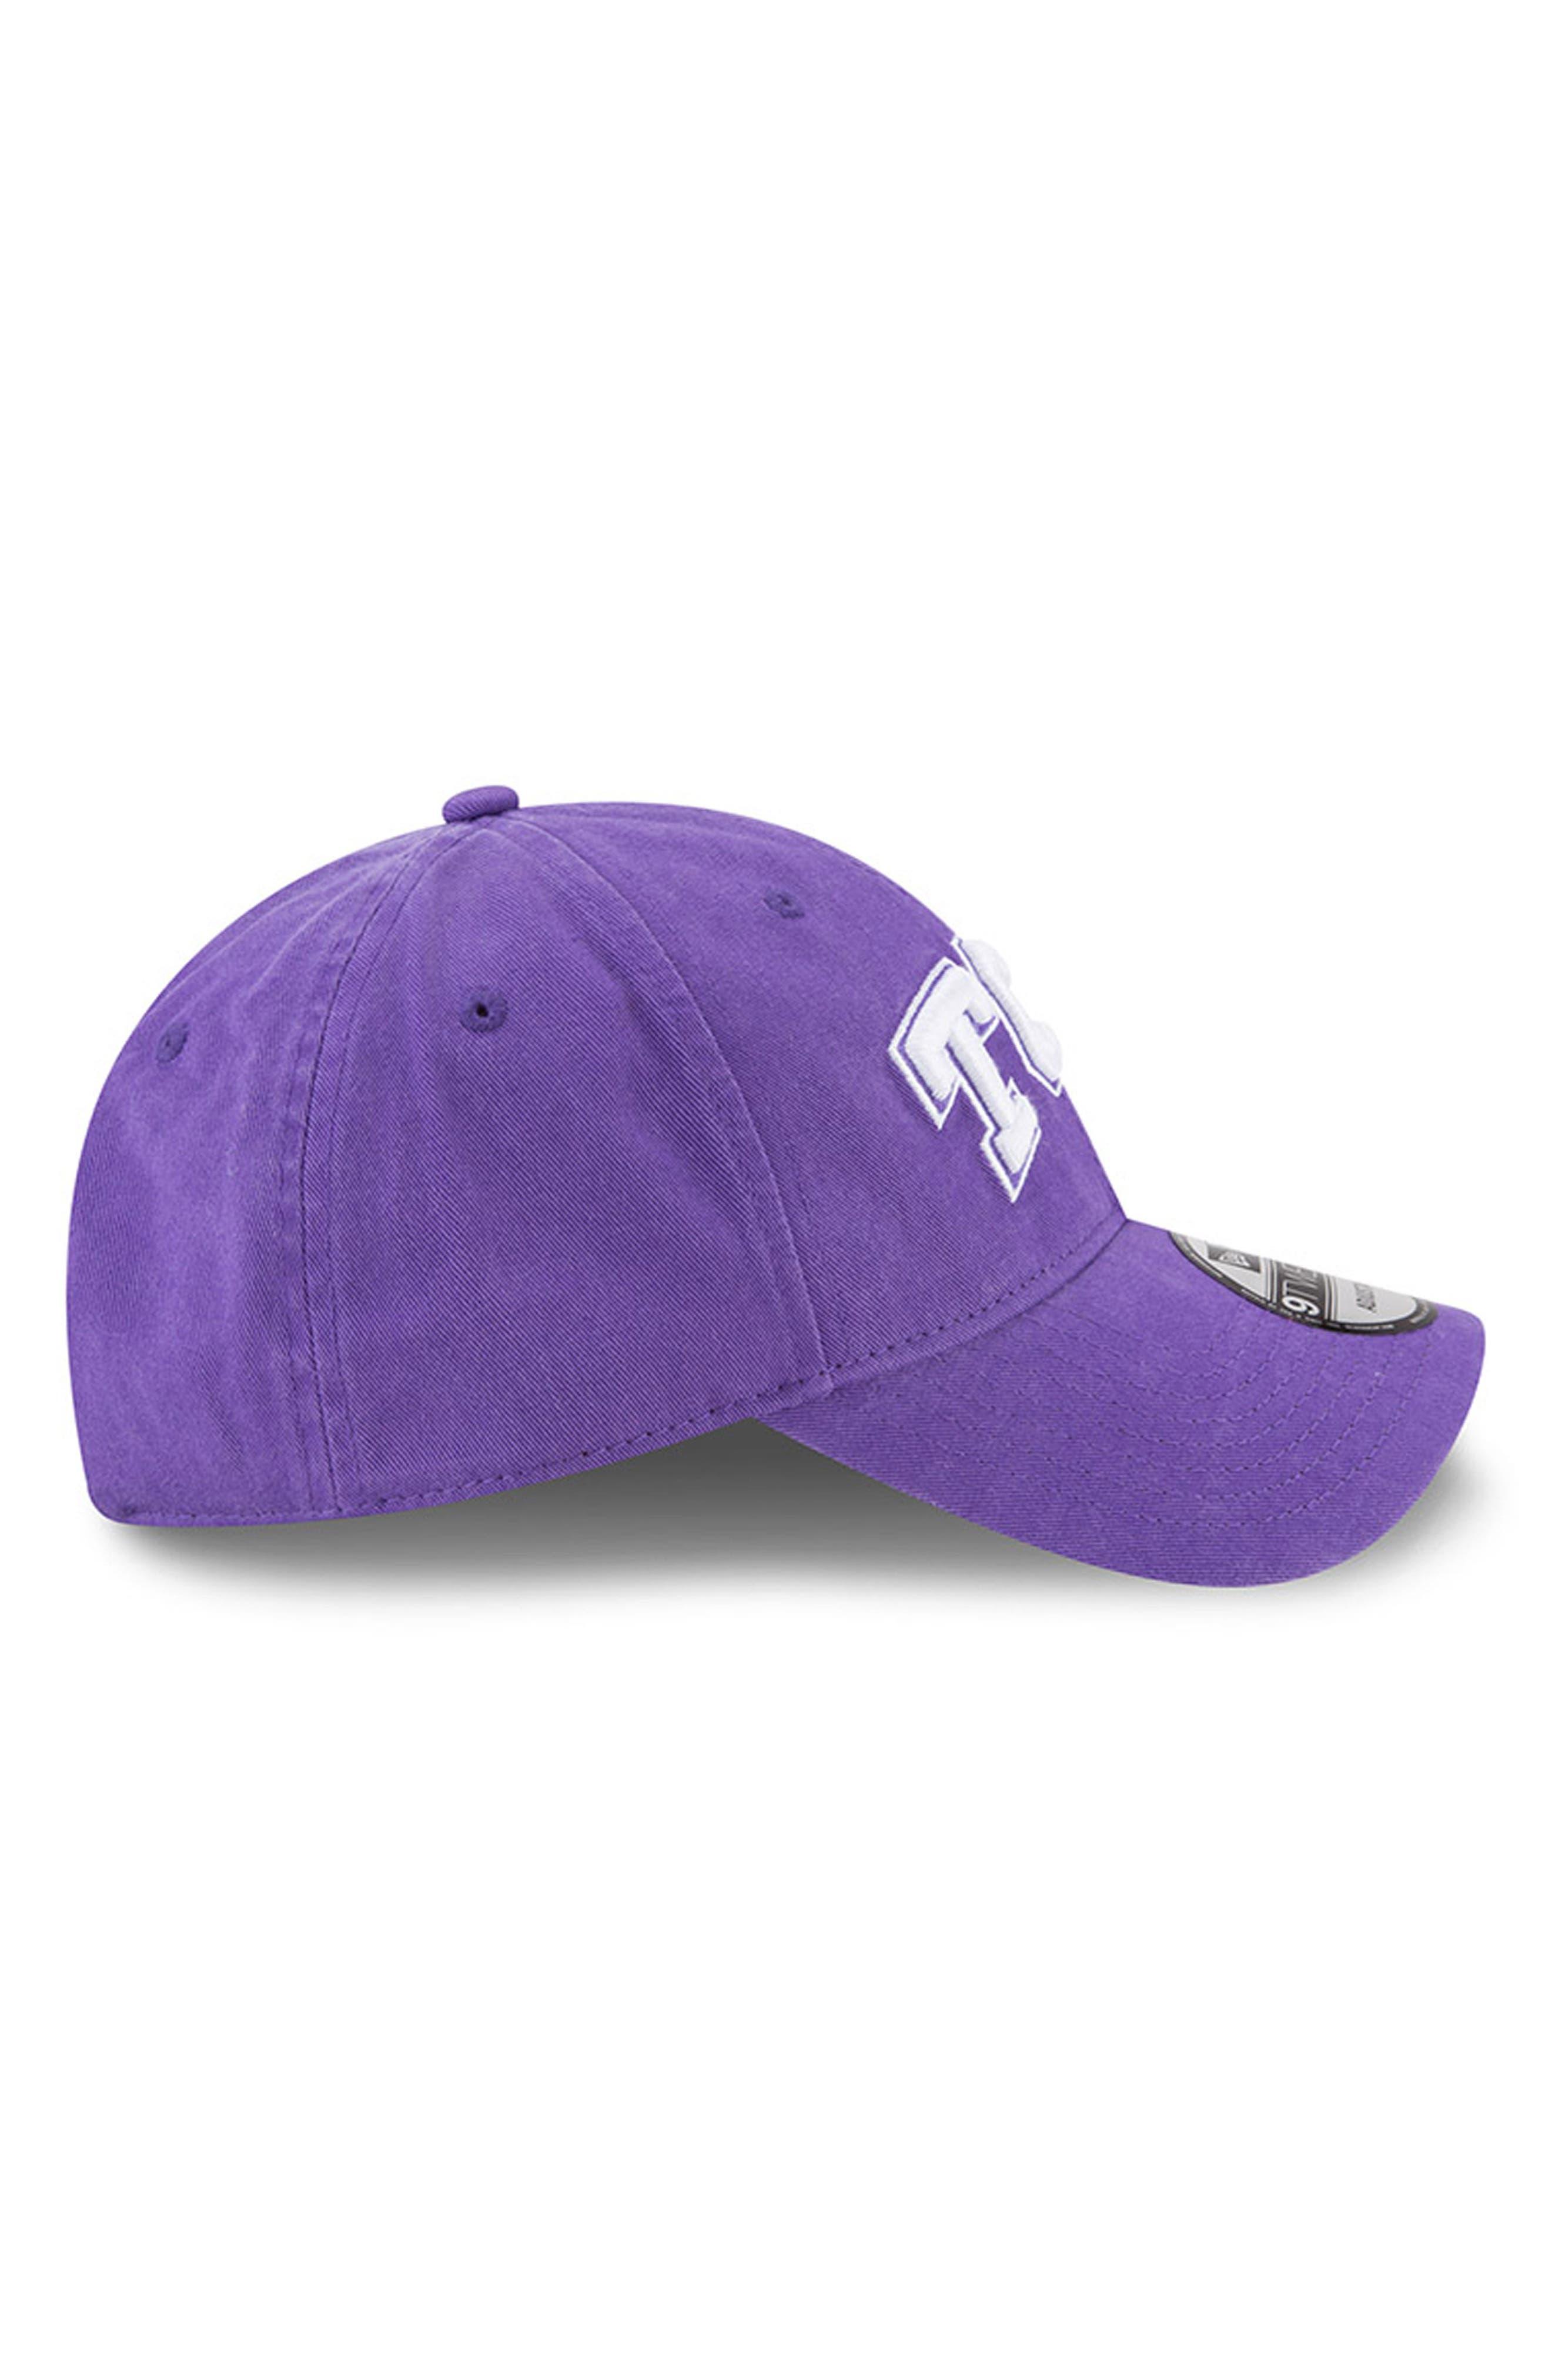 Collegiate Core Classic Baseball Cap,                             Alternate thumbnail 5, color,                             Tcu Horned Frogs